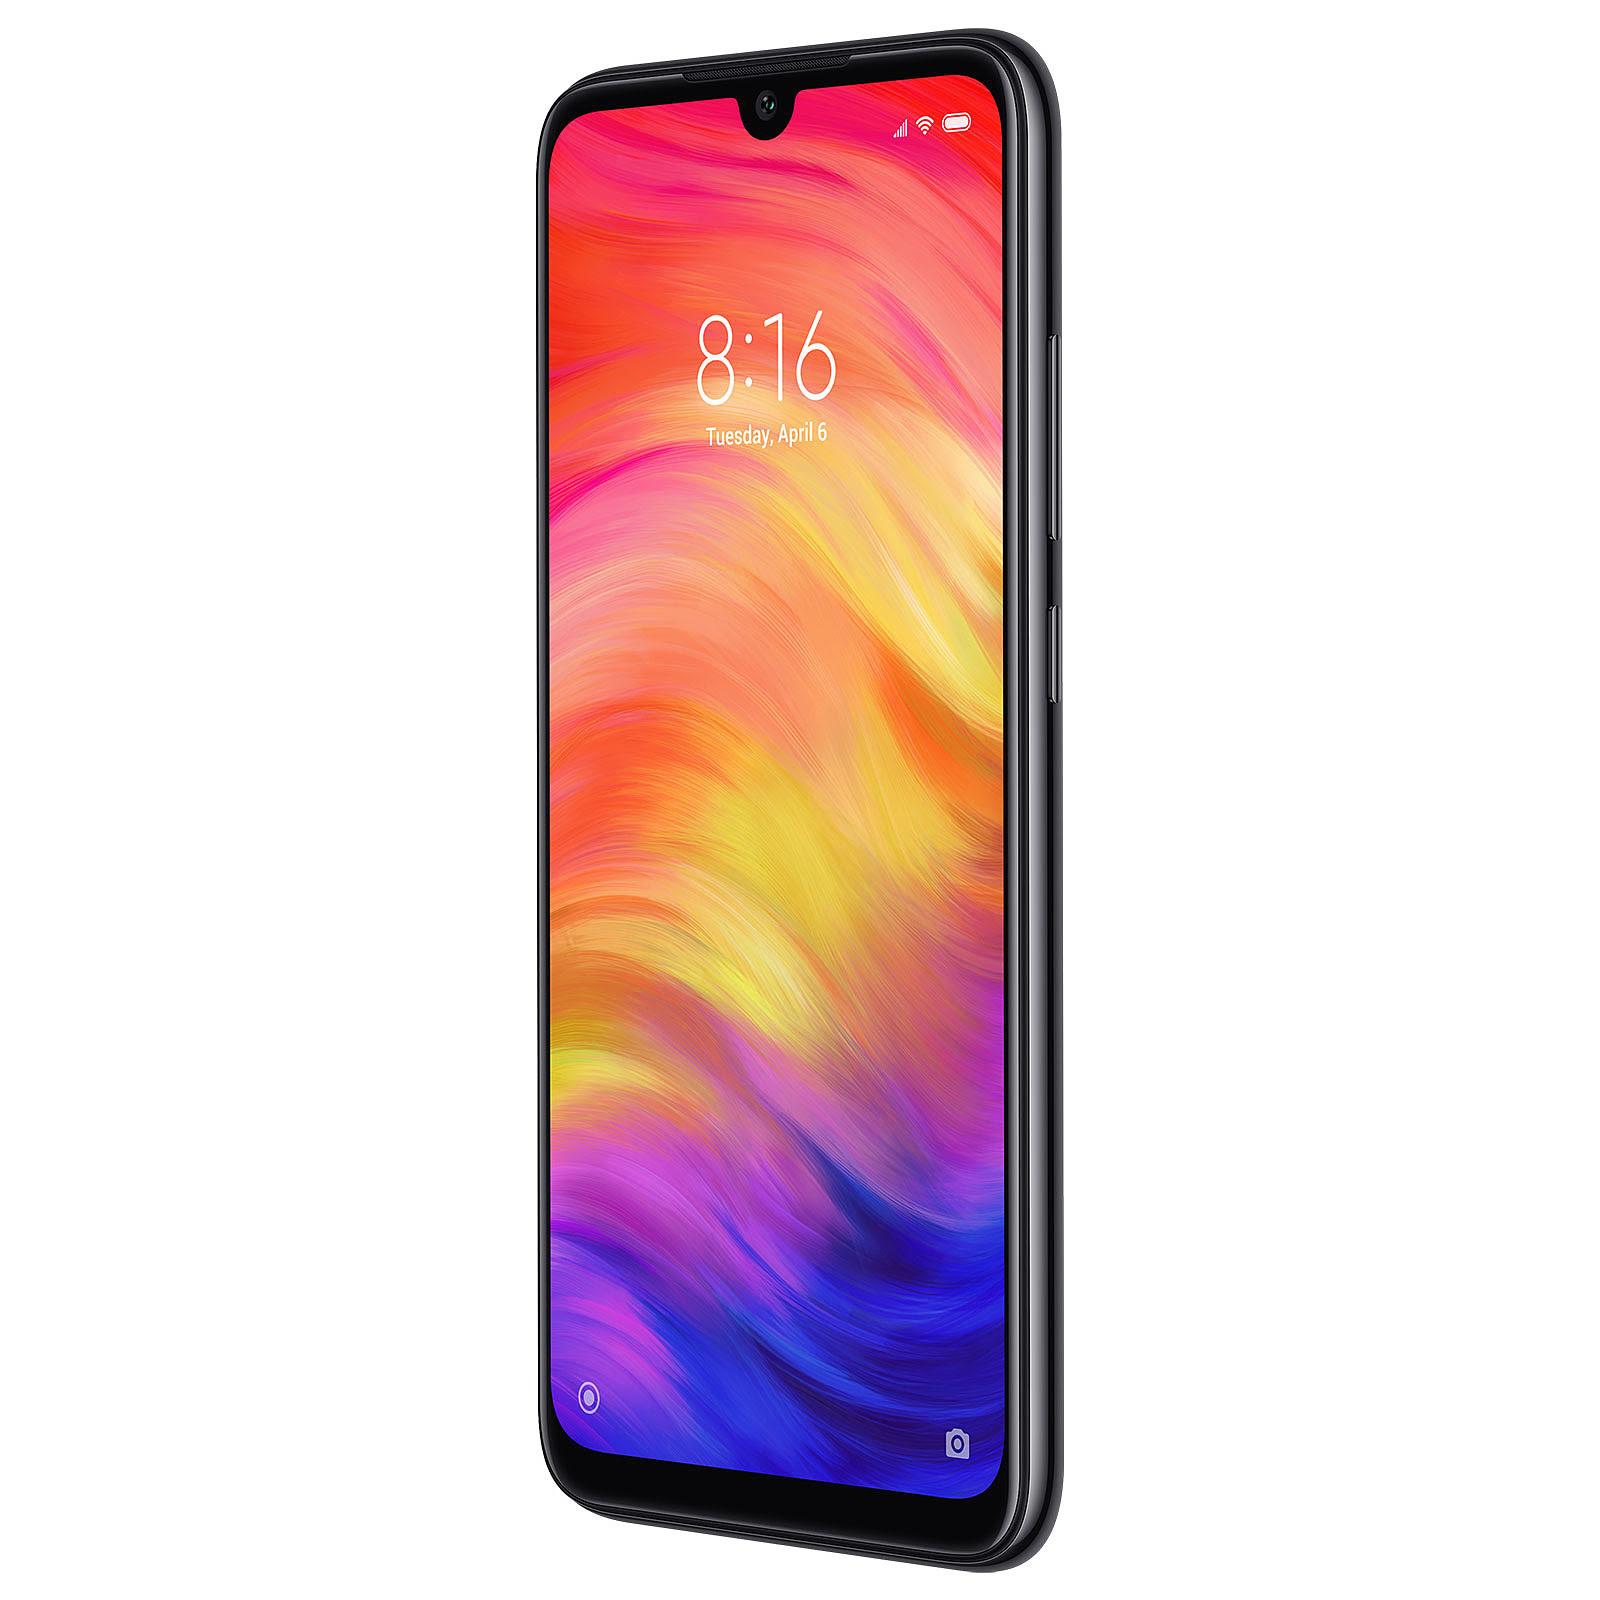 Xiaomi Redmi Note 7 4Go 64Go Noir - Téléphonie Xiaomi - 1